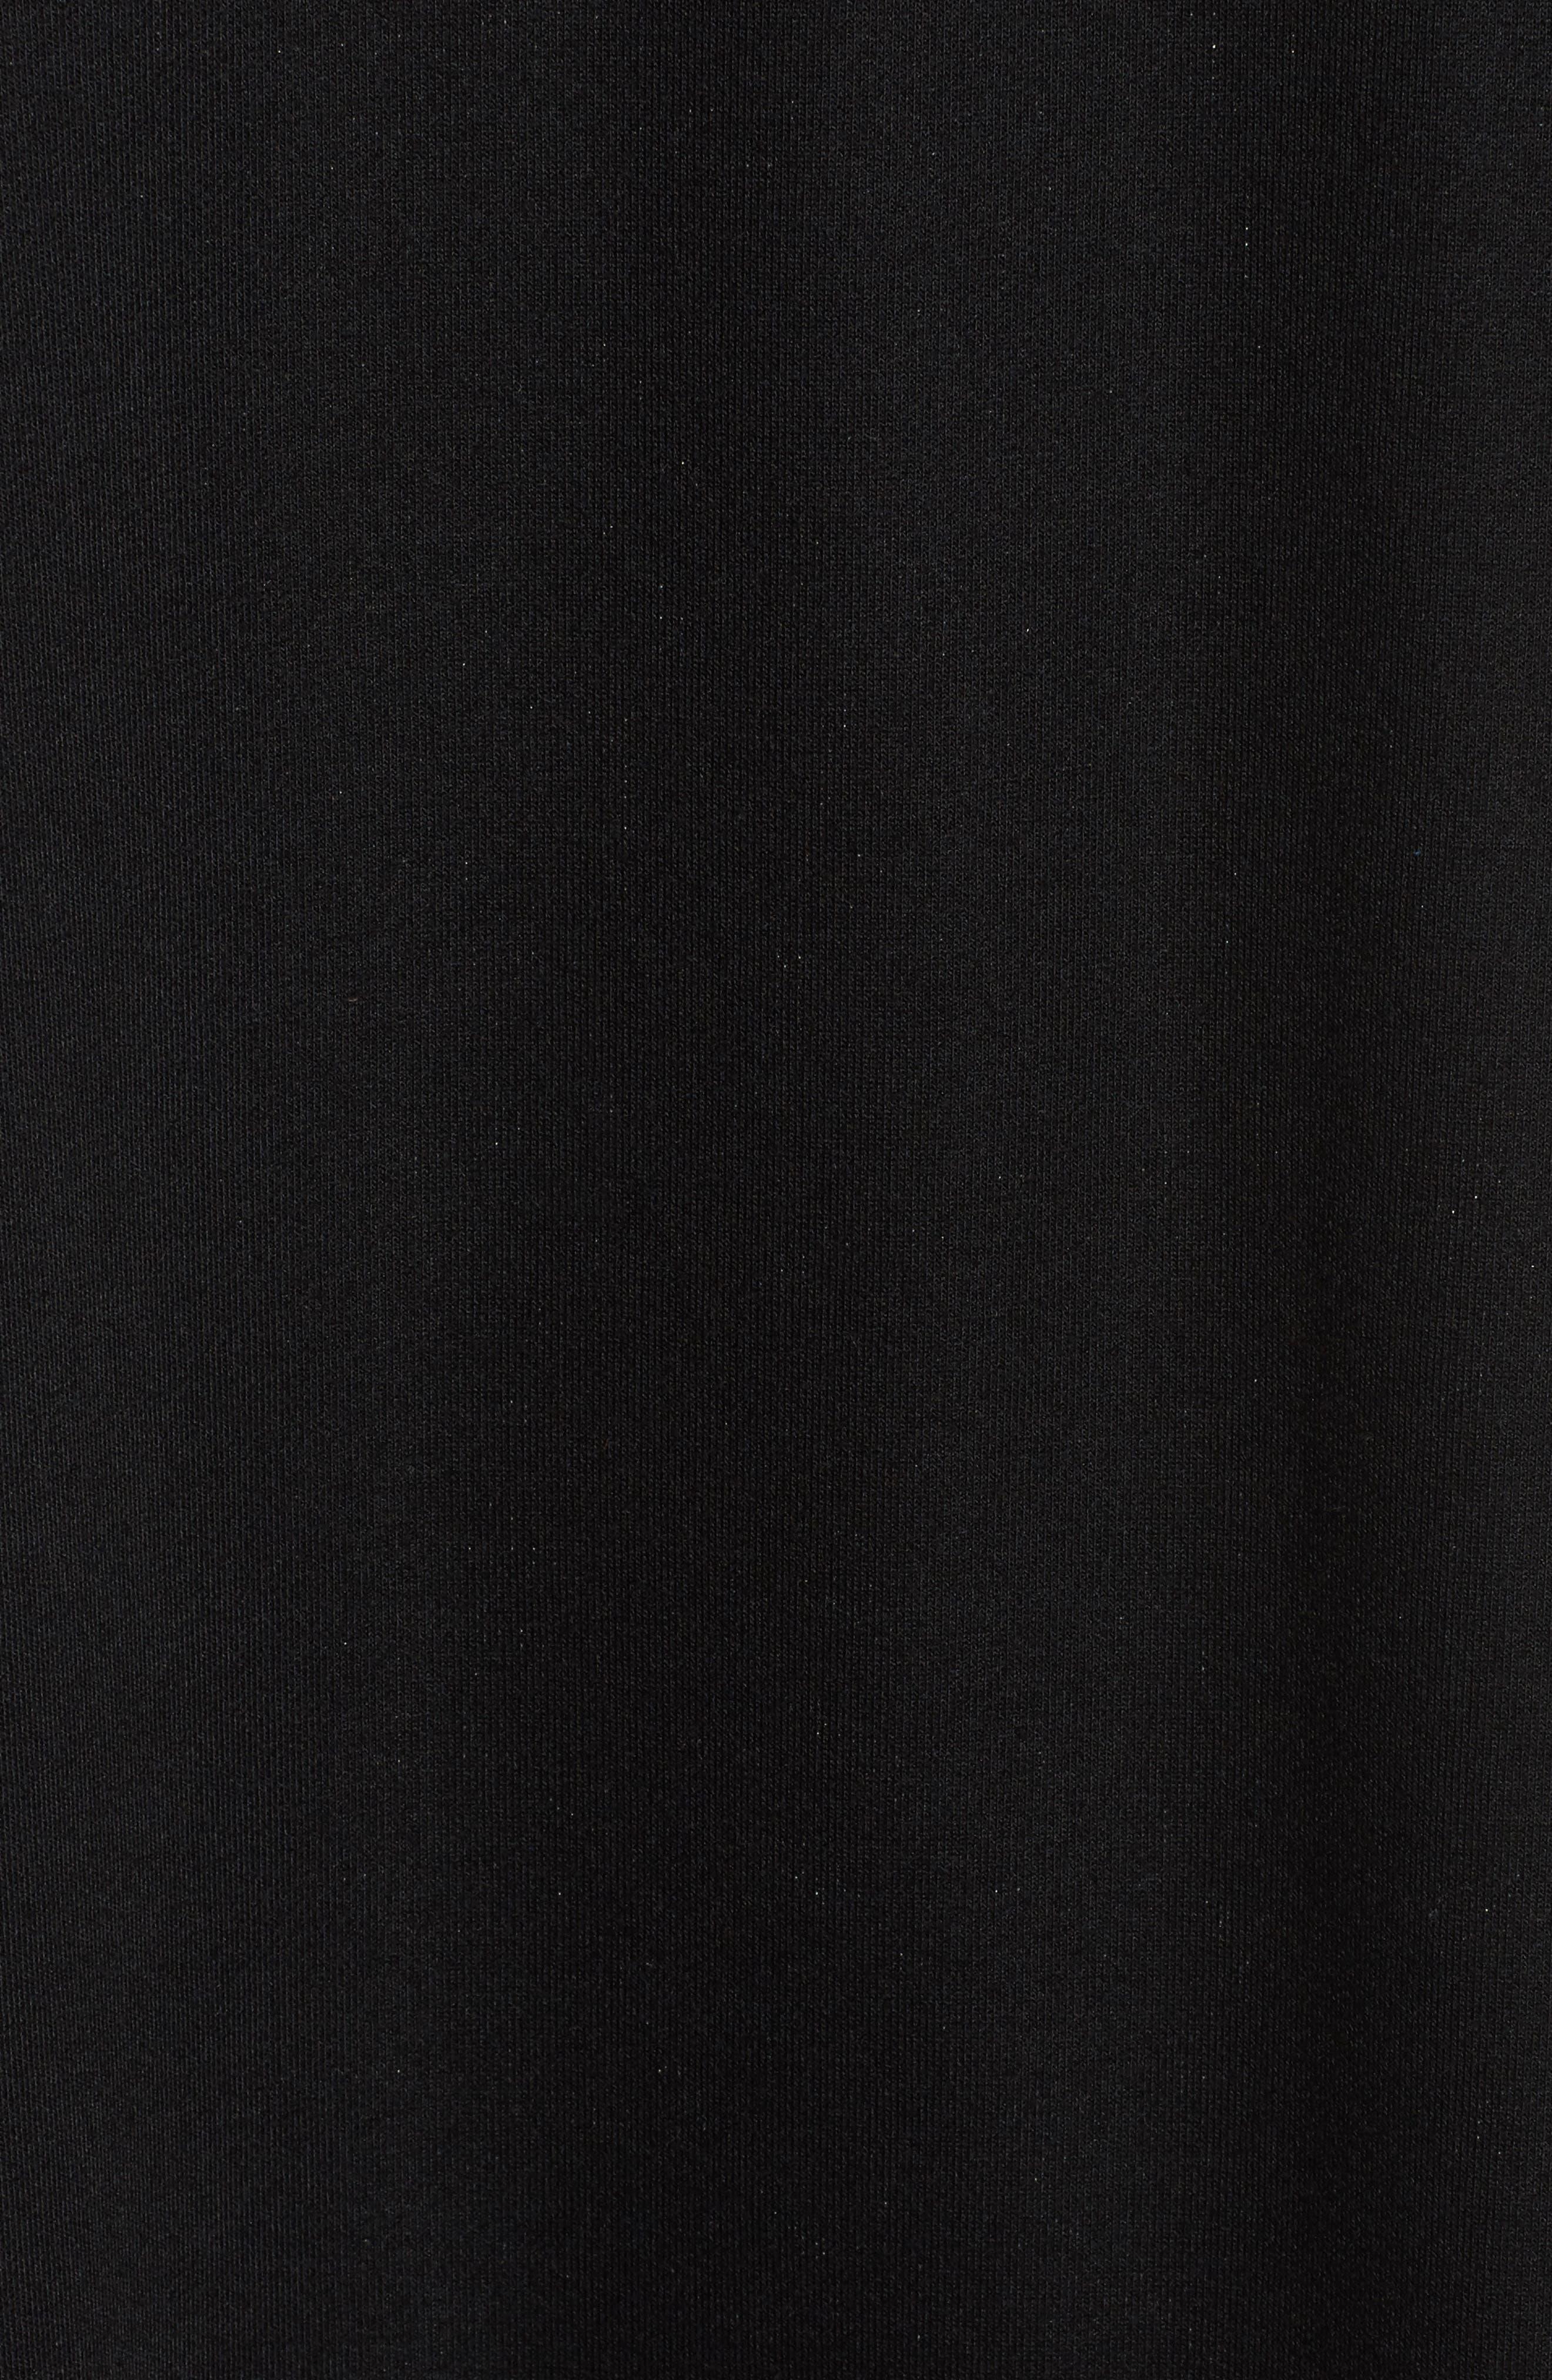 CHELSEA28,                             Ruffle Hem Sweatshirt Dress,                             Alternate thumbnail 5, color,                             001